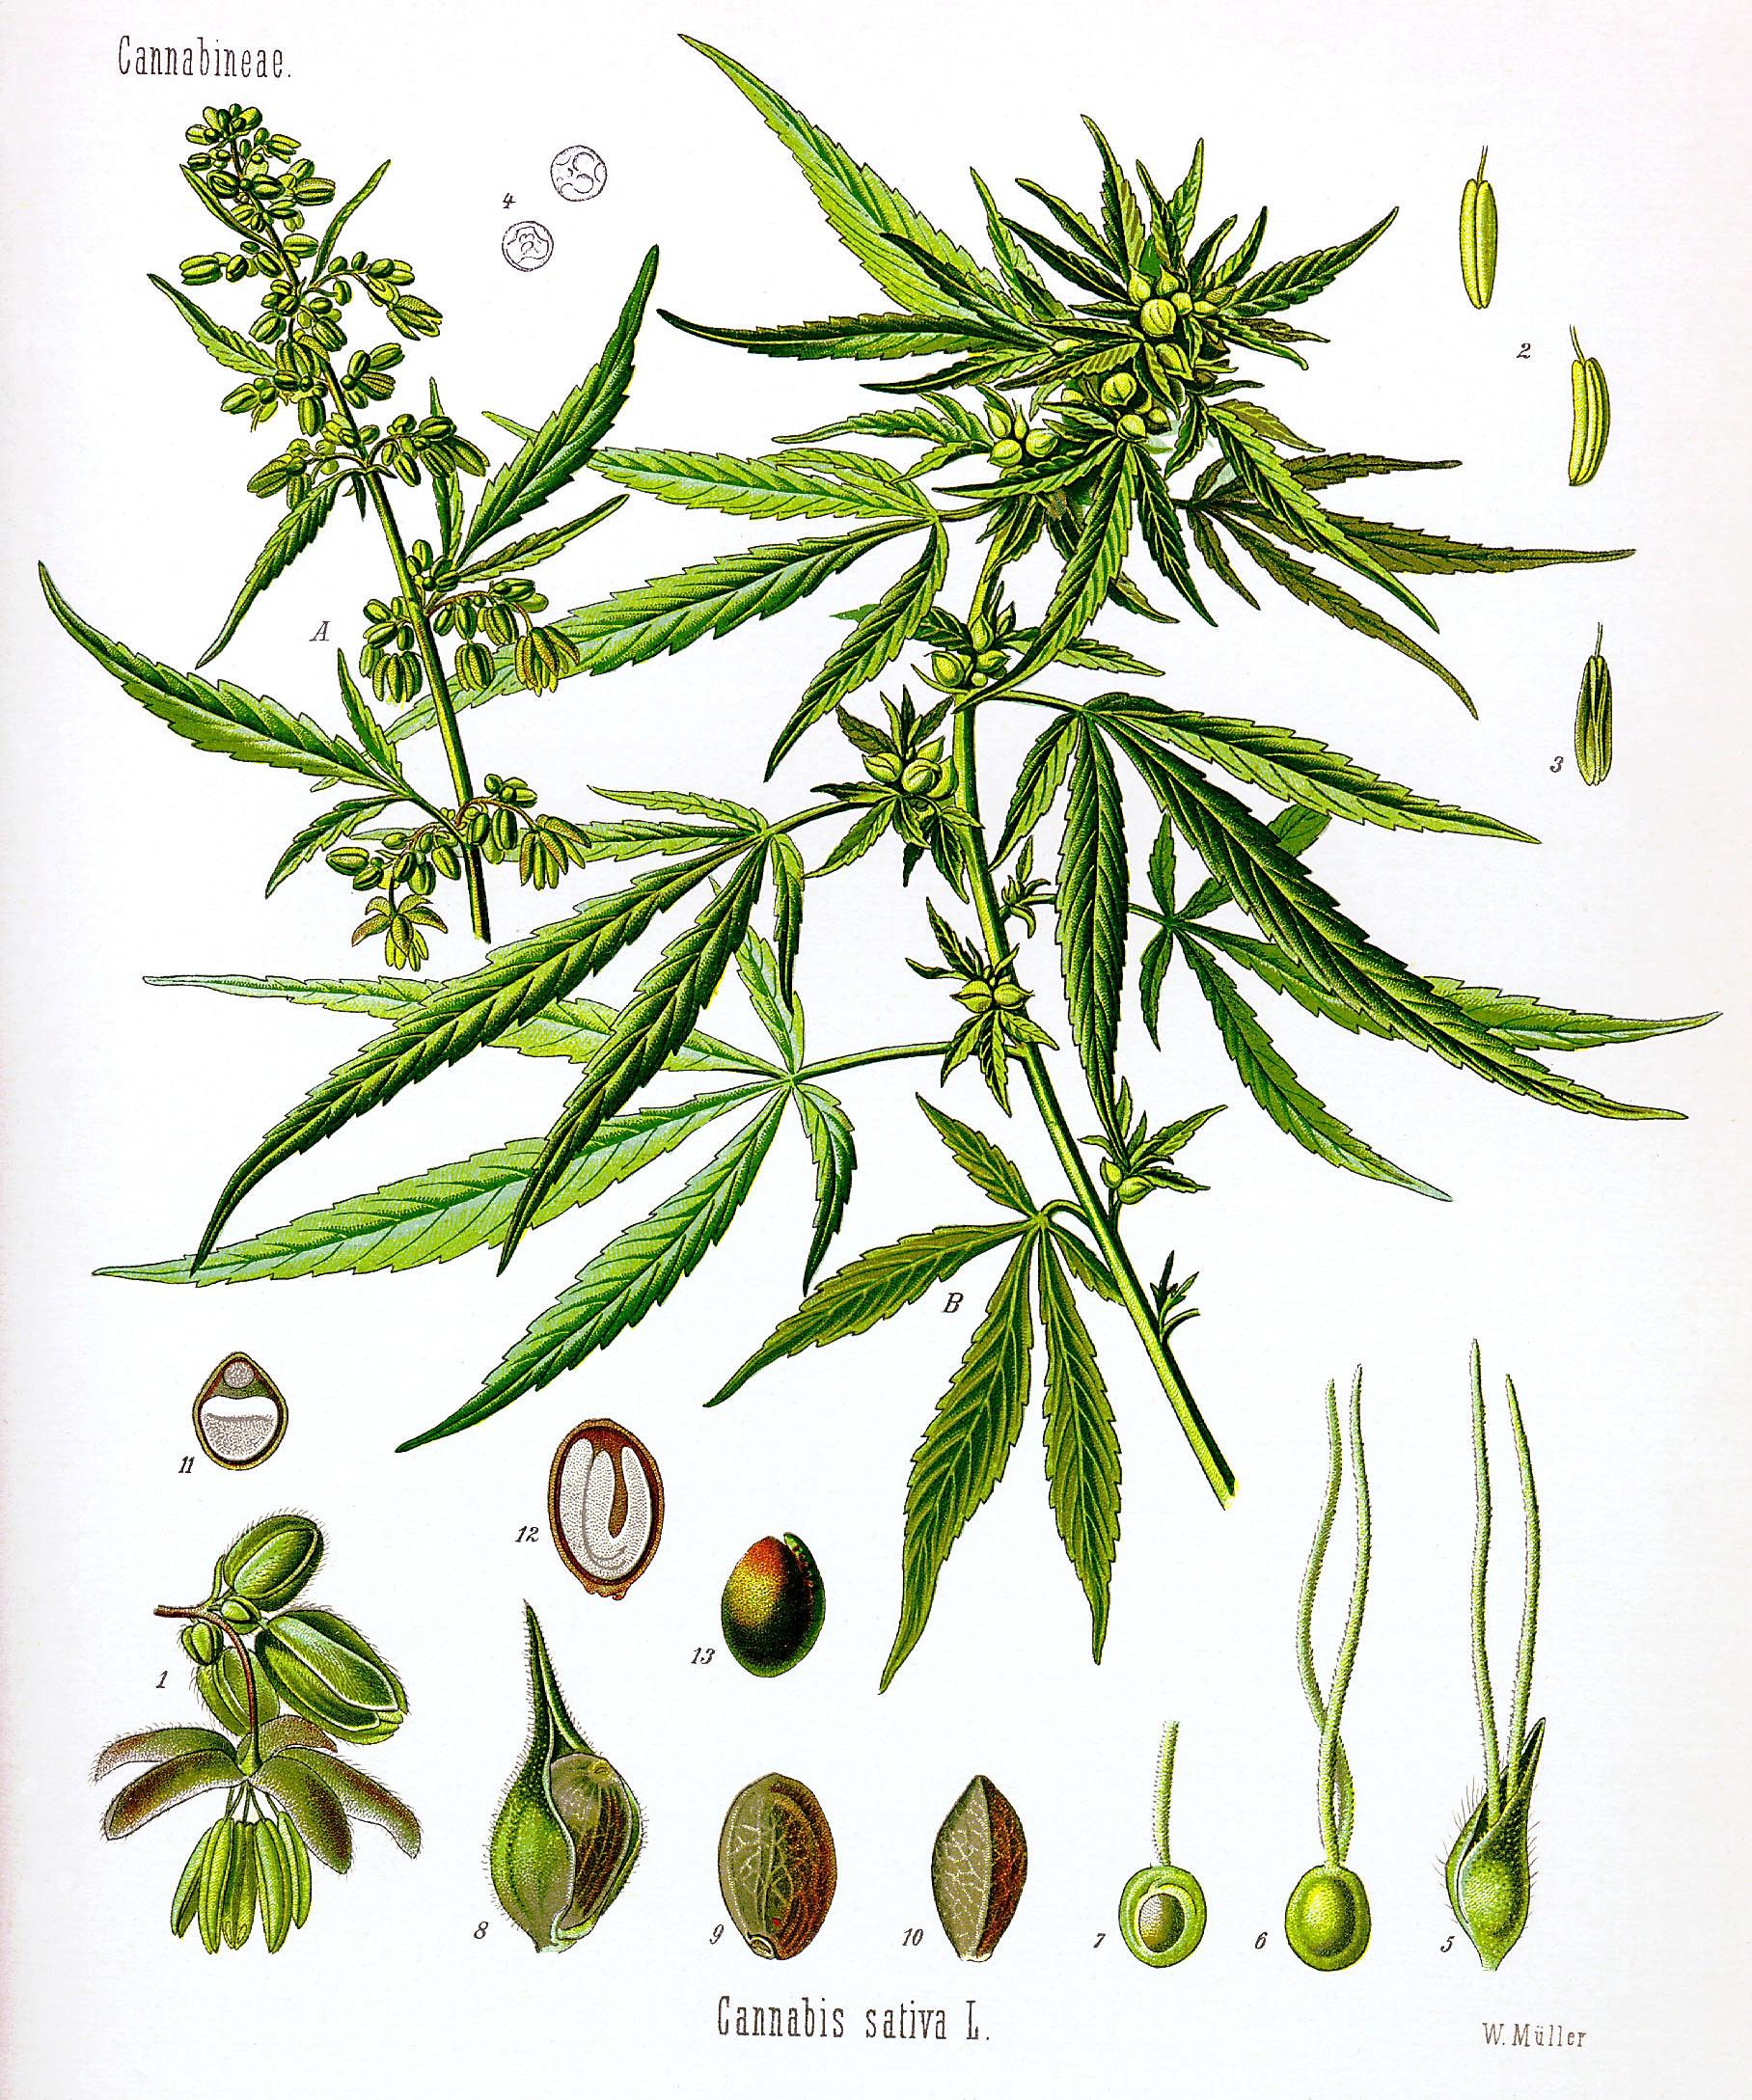 Cannabis plant biological illustration